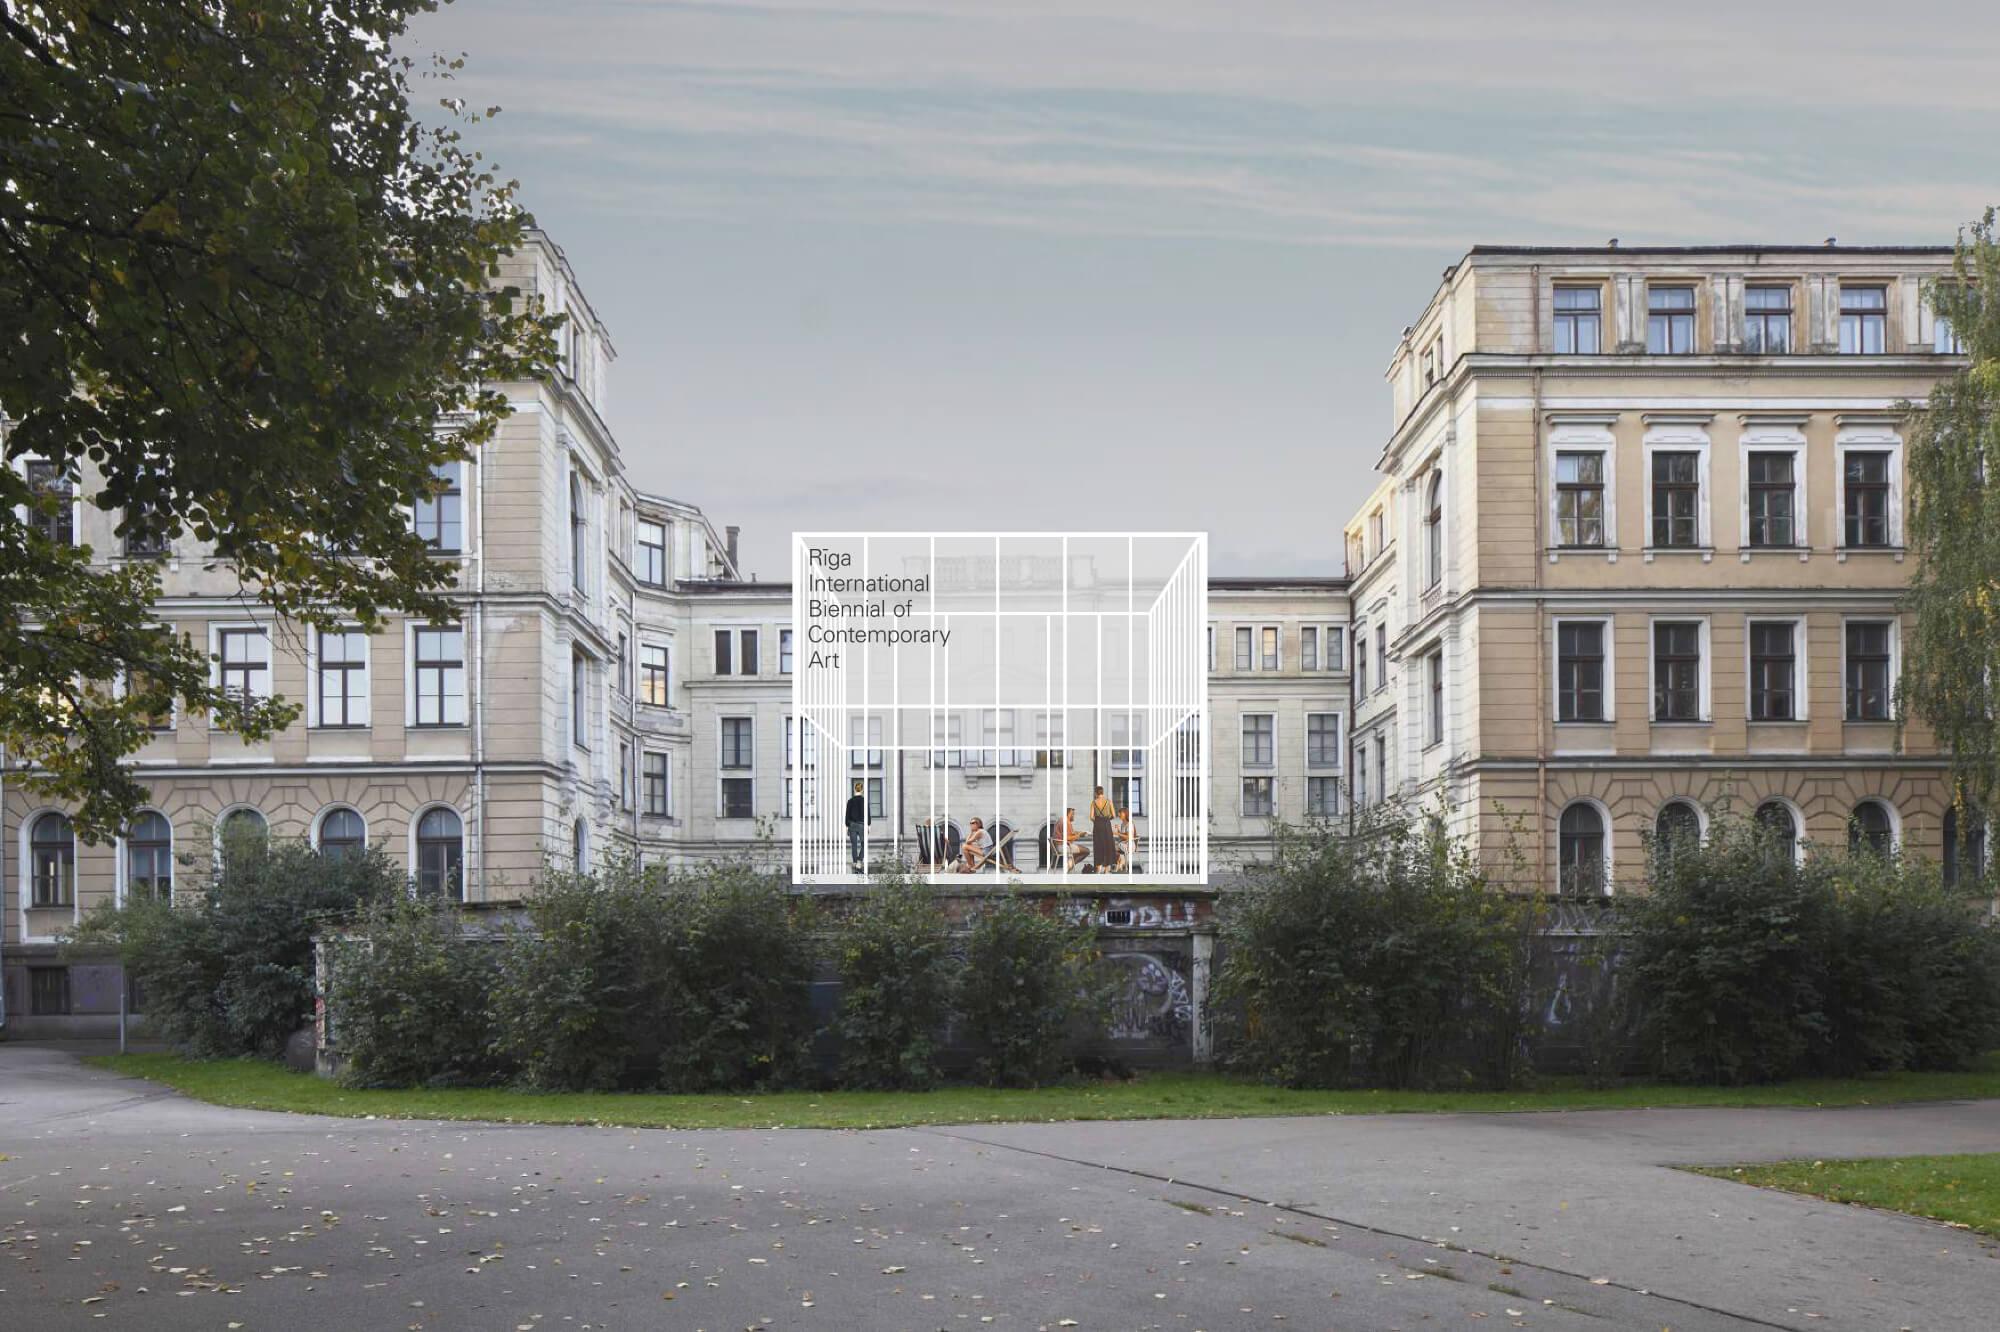 gaiss-arhitekti-riboca-01